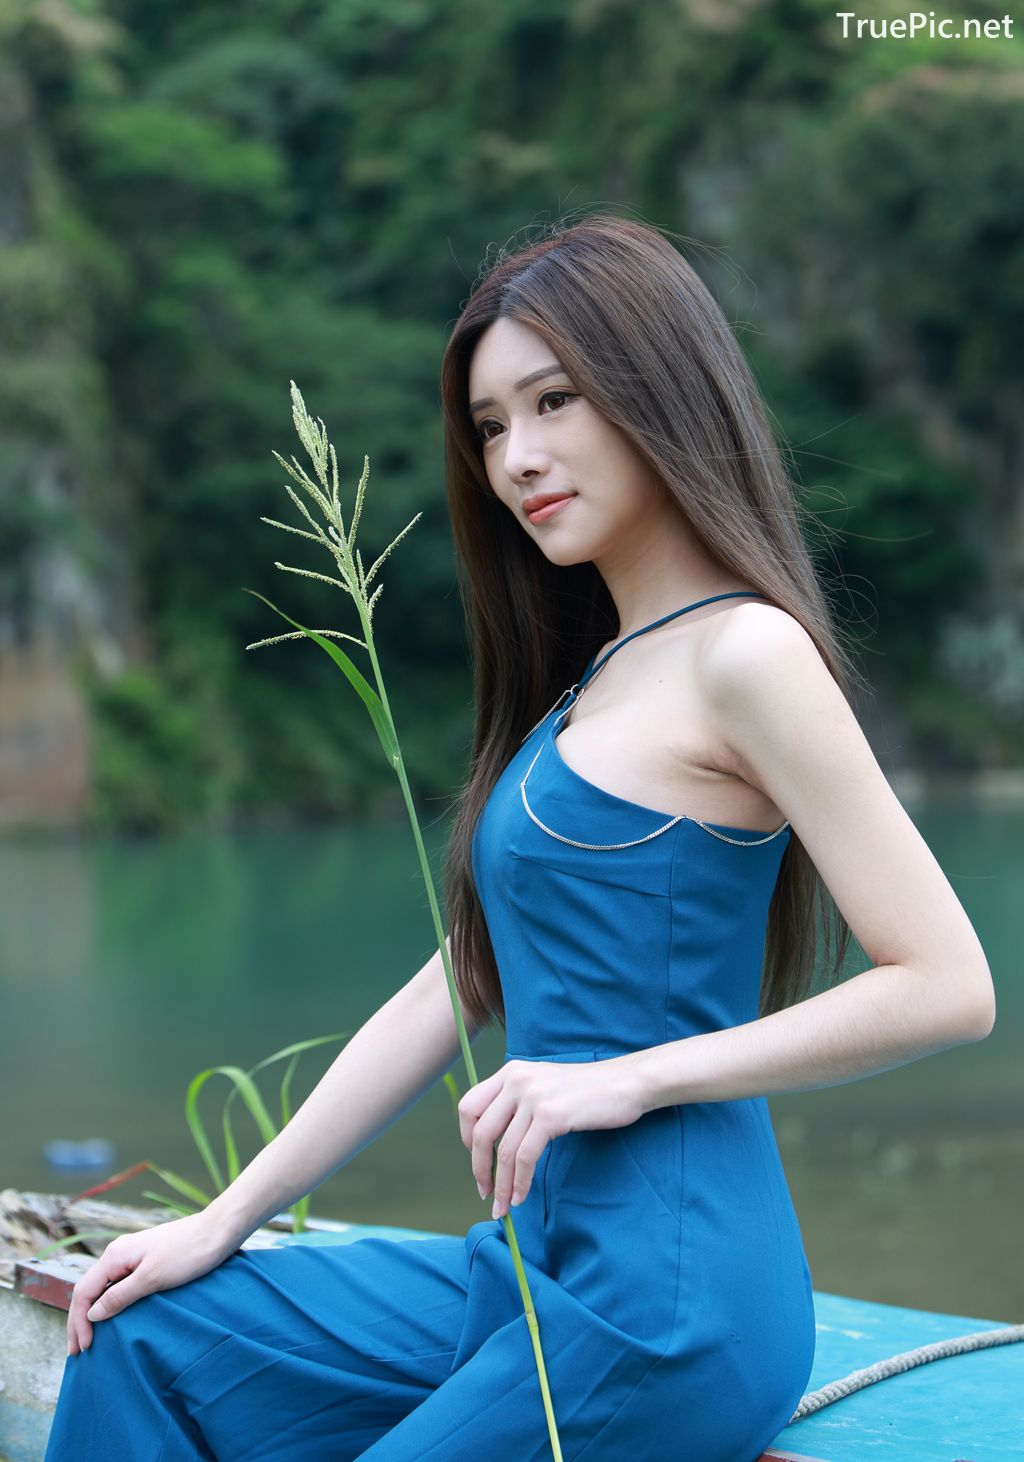 Thailand Girl Freya Khunanya Hot Picture and Photo - Page